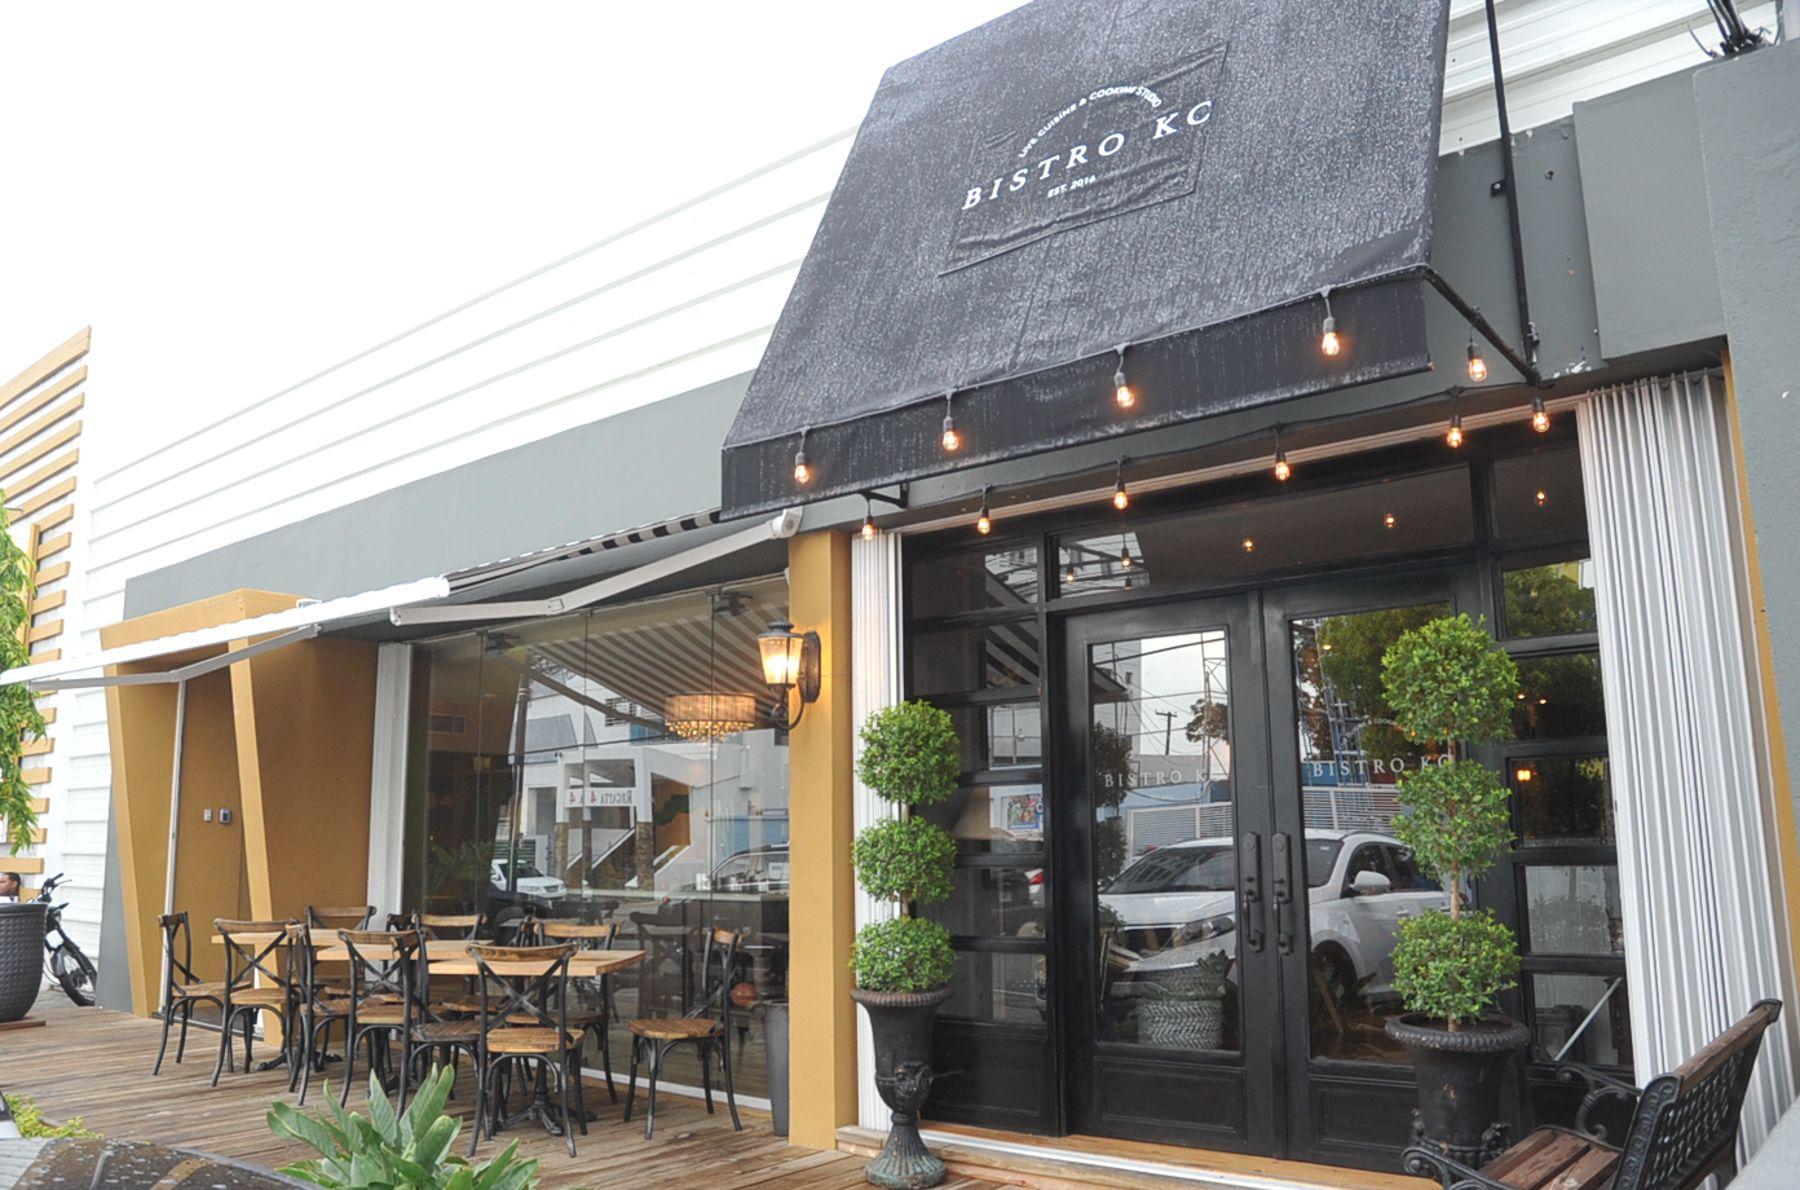 Bistro KC Live Cuisine & Cooking Studio: Un mimo francés a tu paladar